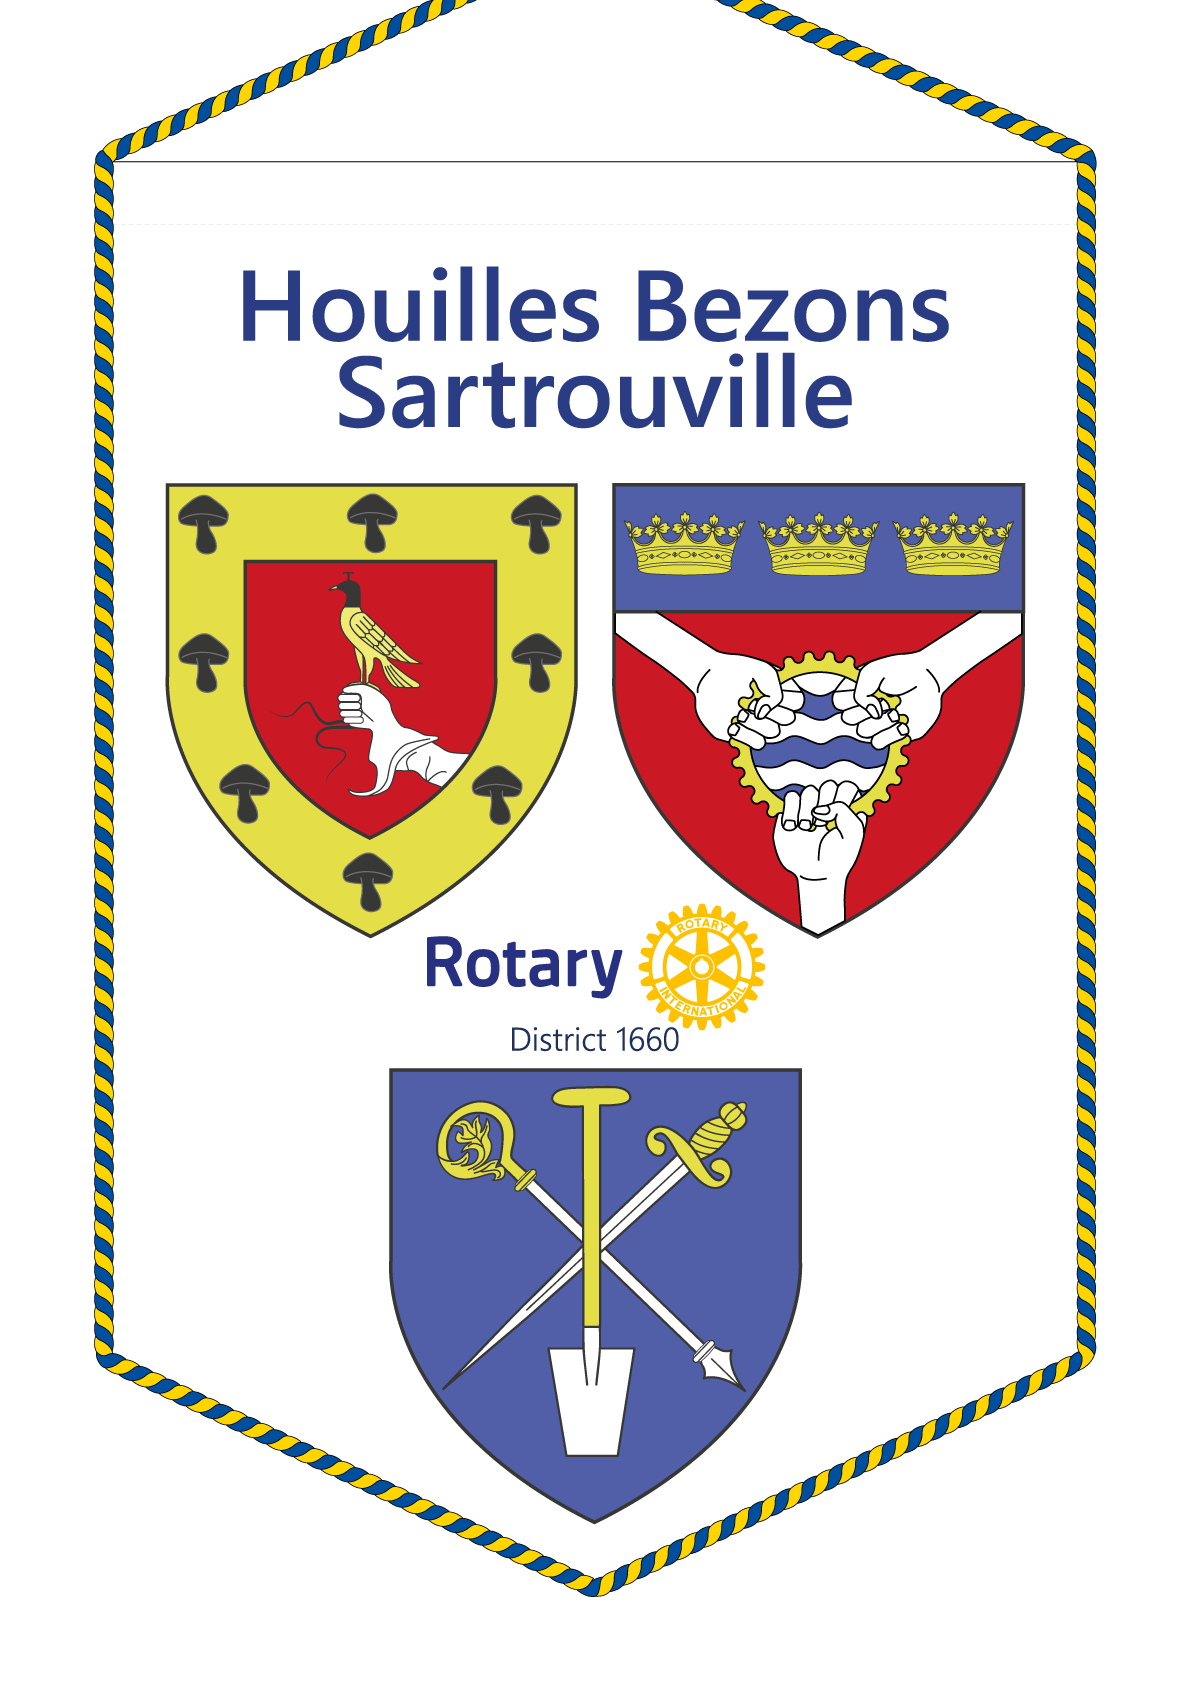 FANION ROTARY CLUB HOUILLES BEZONS SARTROUVILLE